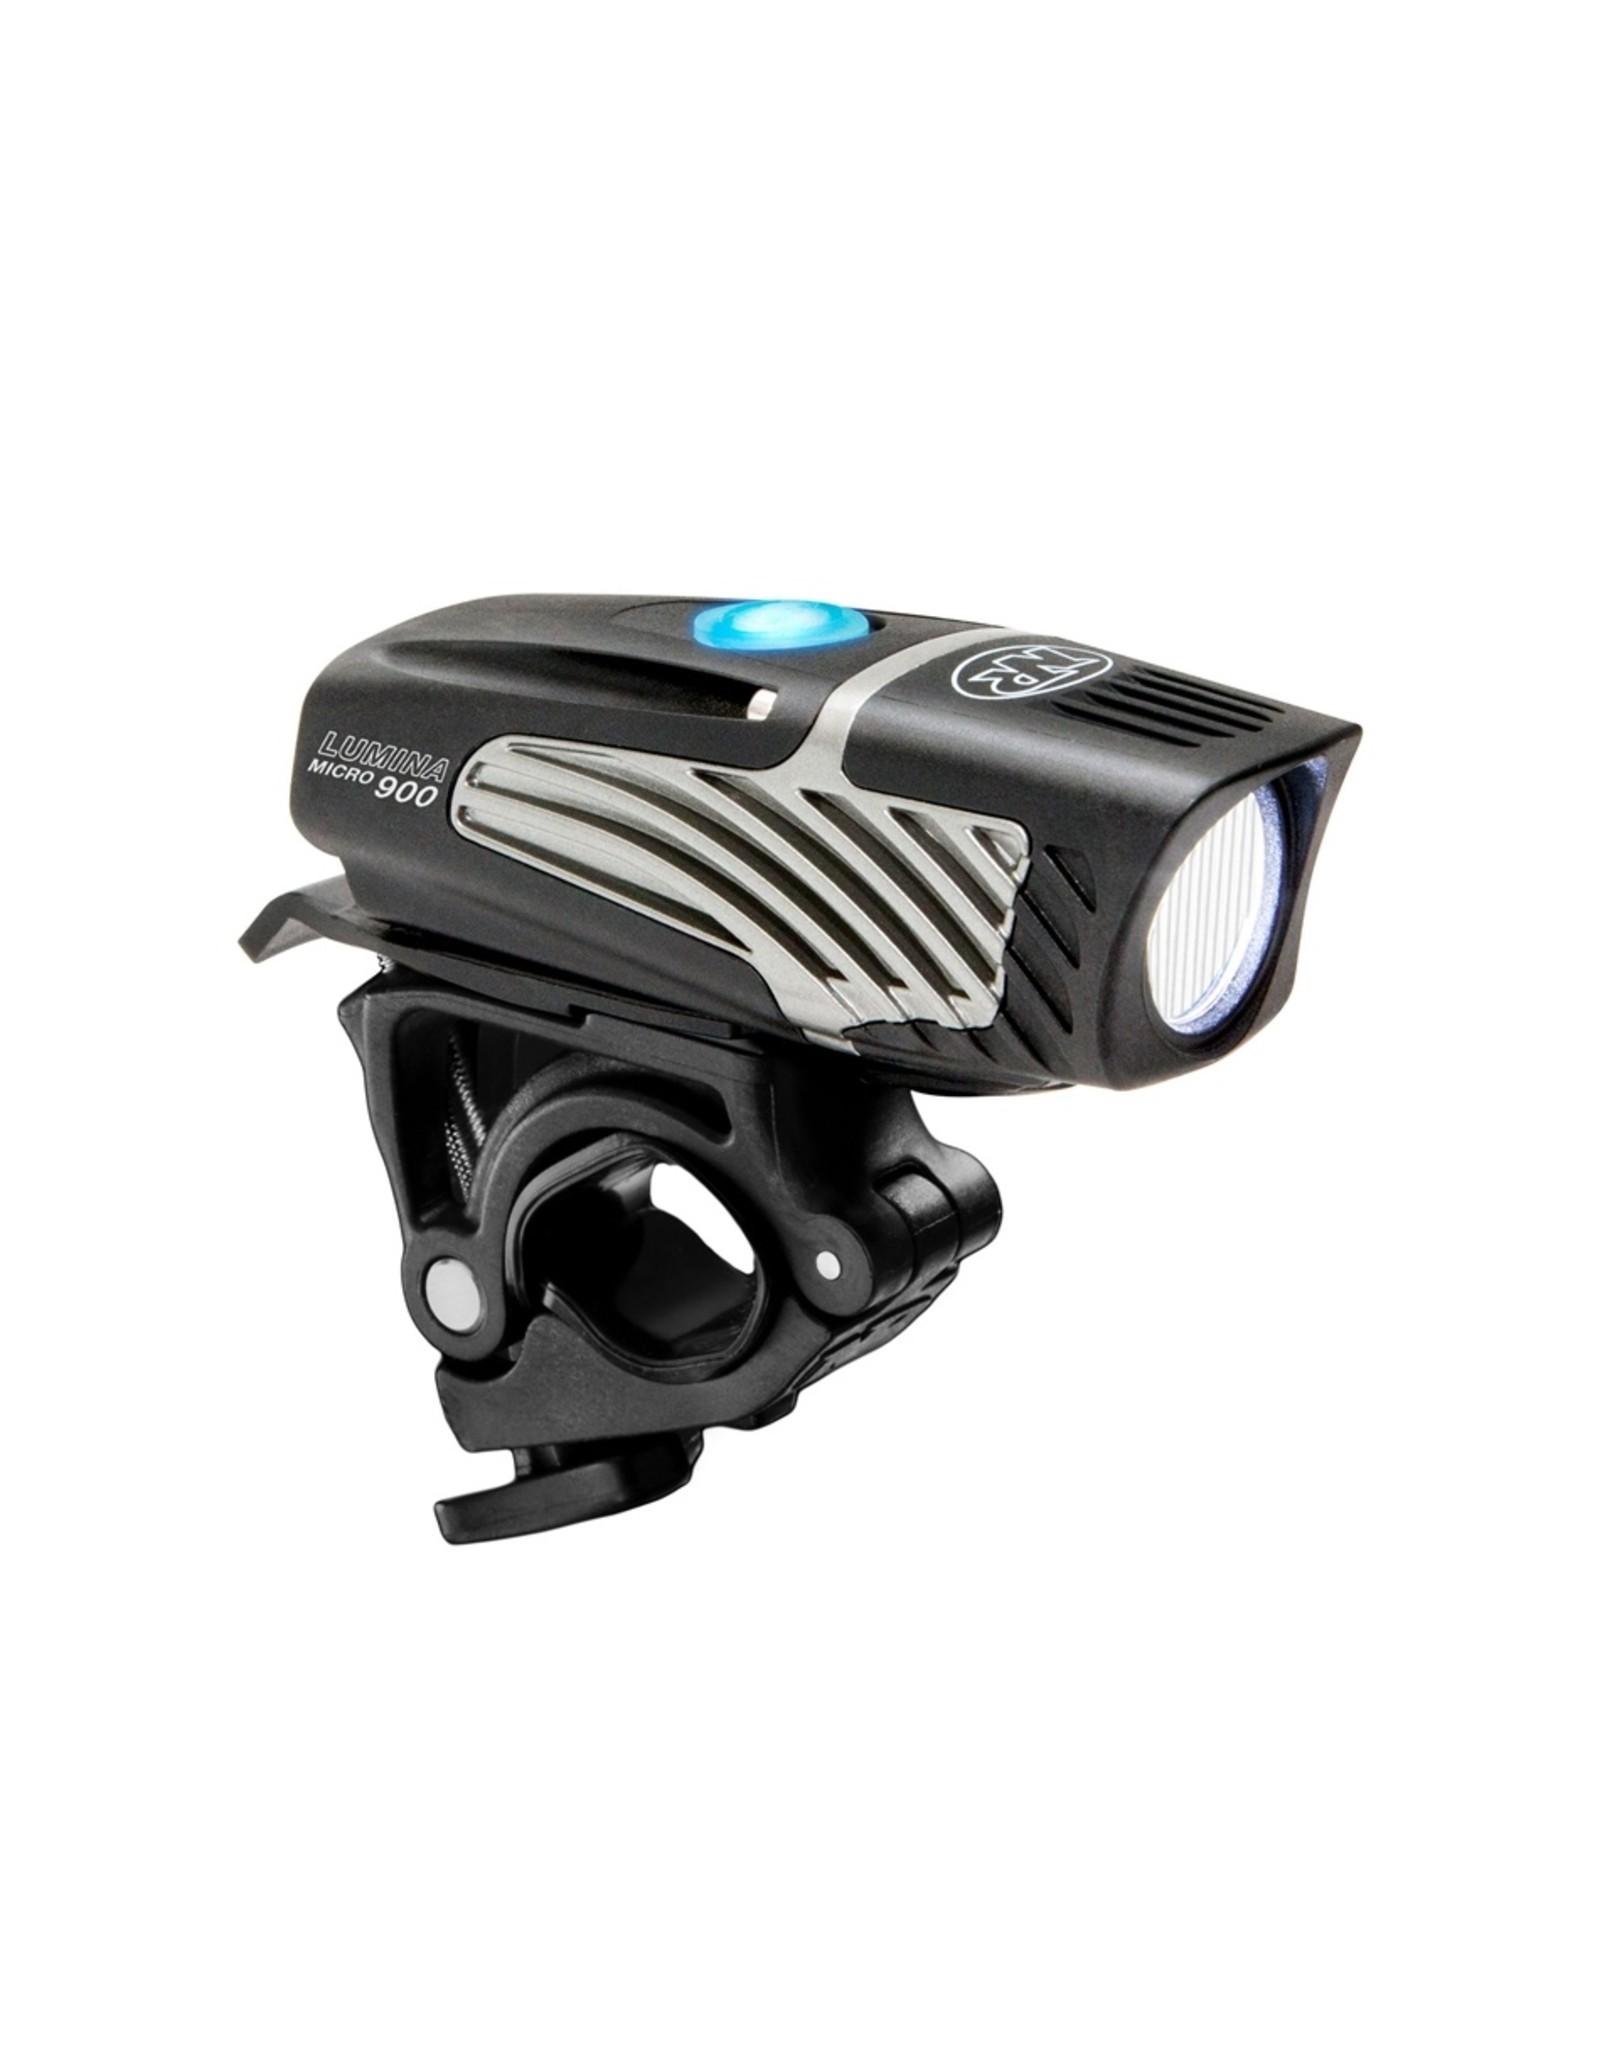 NiteRider Lumina Micro 900 LED Cordless Light System